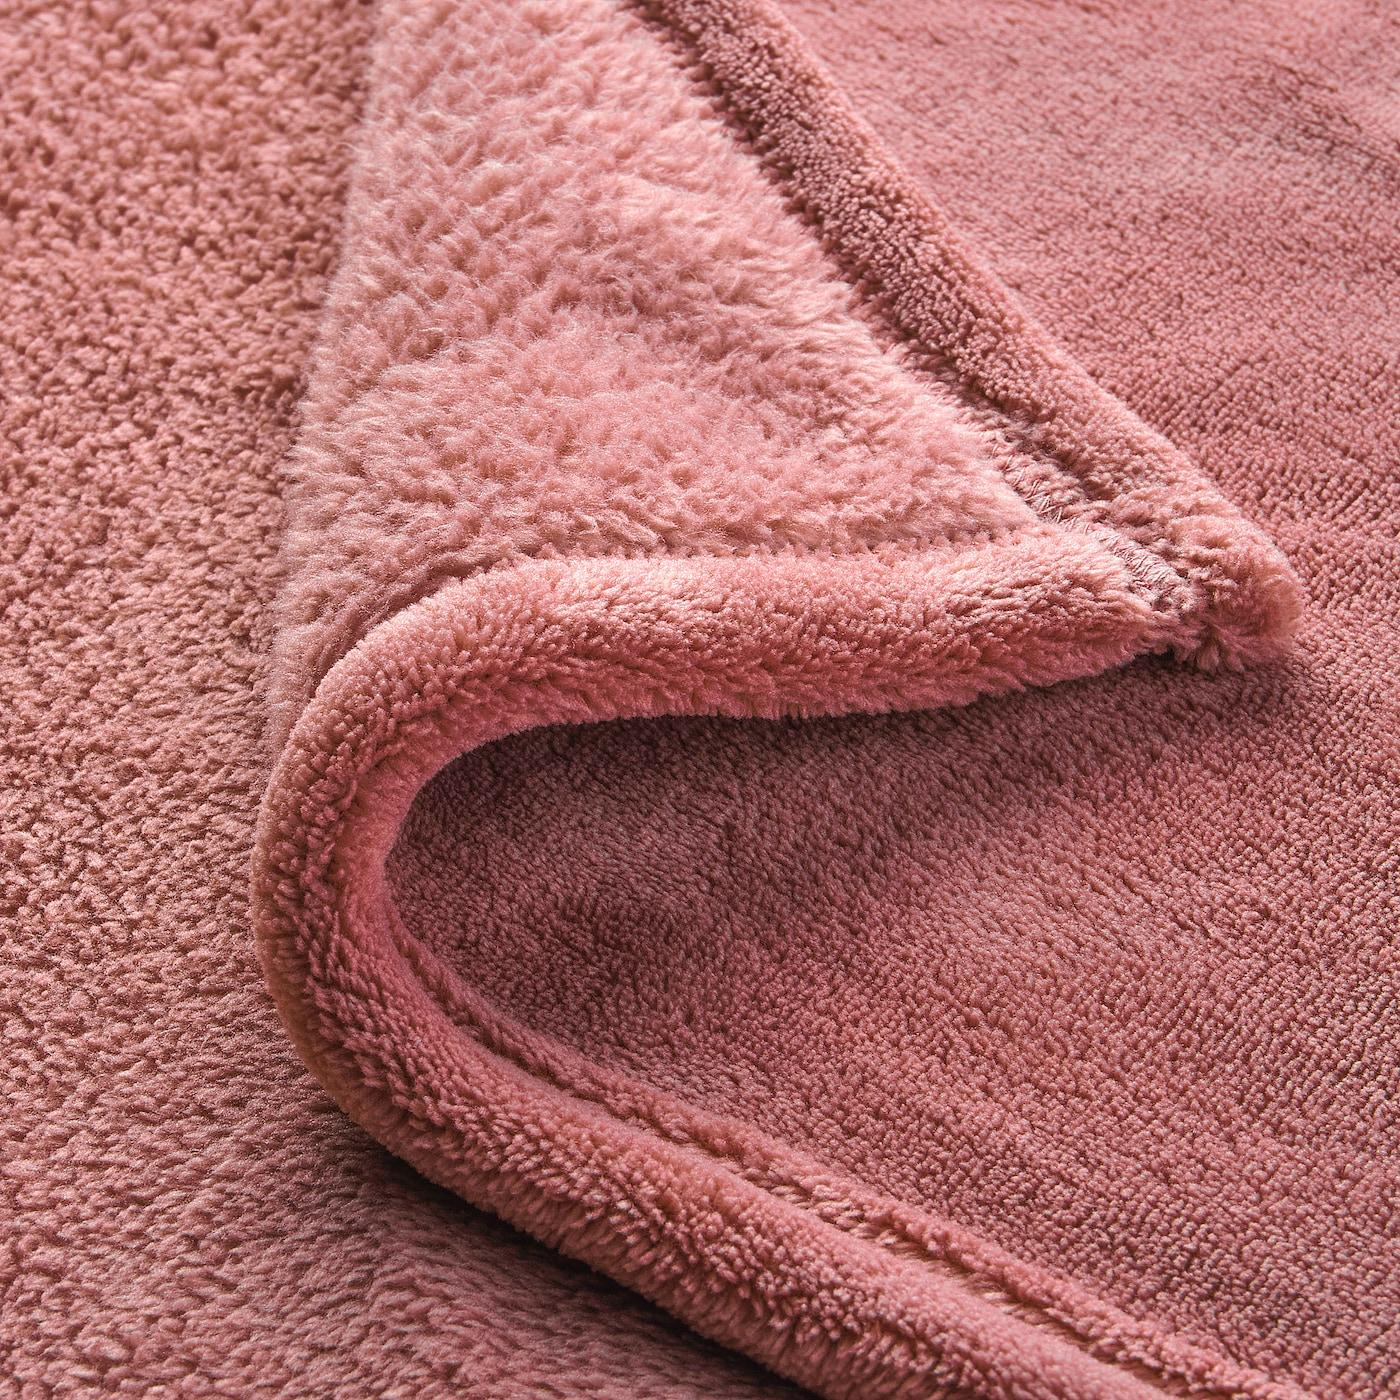 TRATTVIVA ТРАТТВІВА Покривало - темно-рожевий 230x250 см